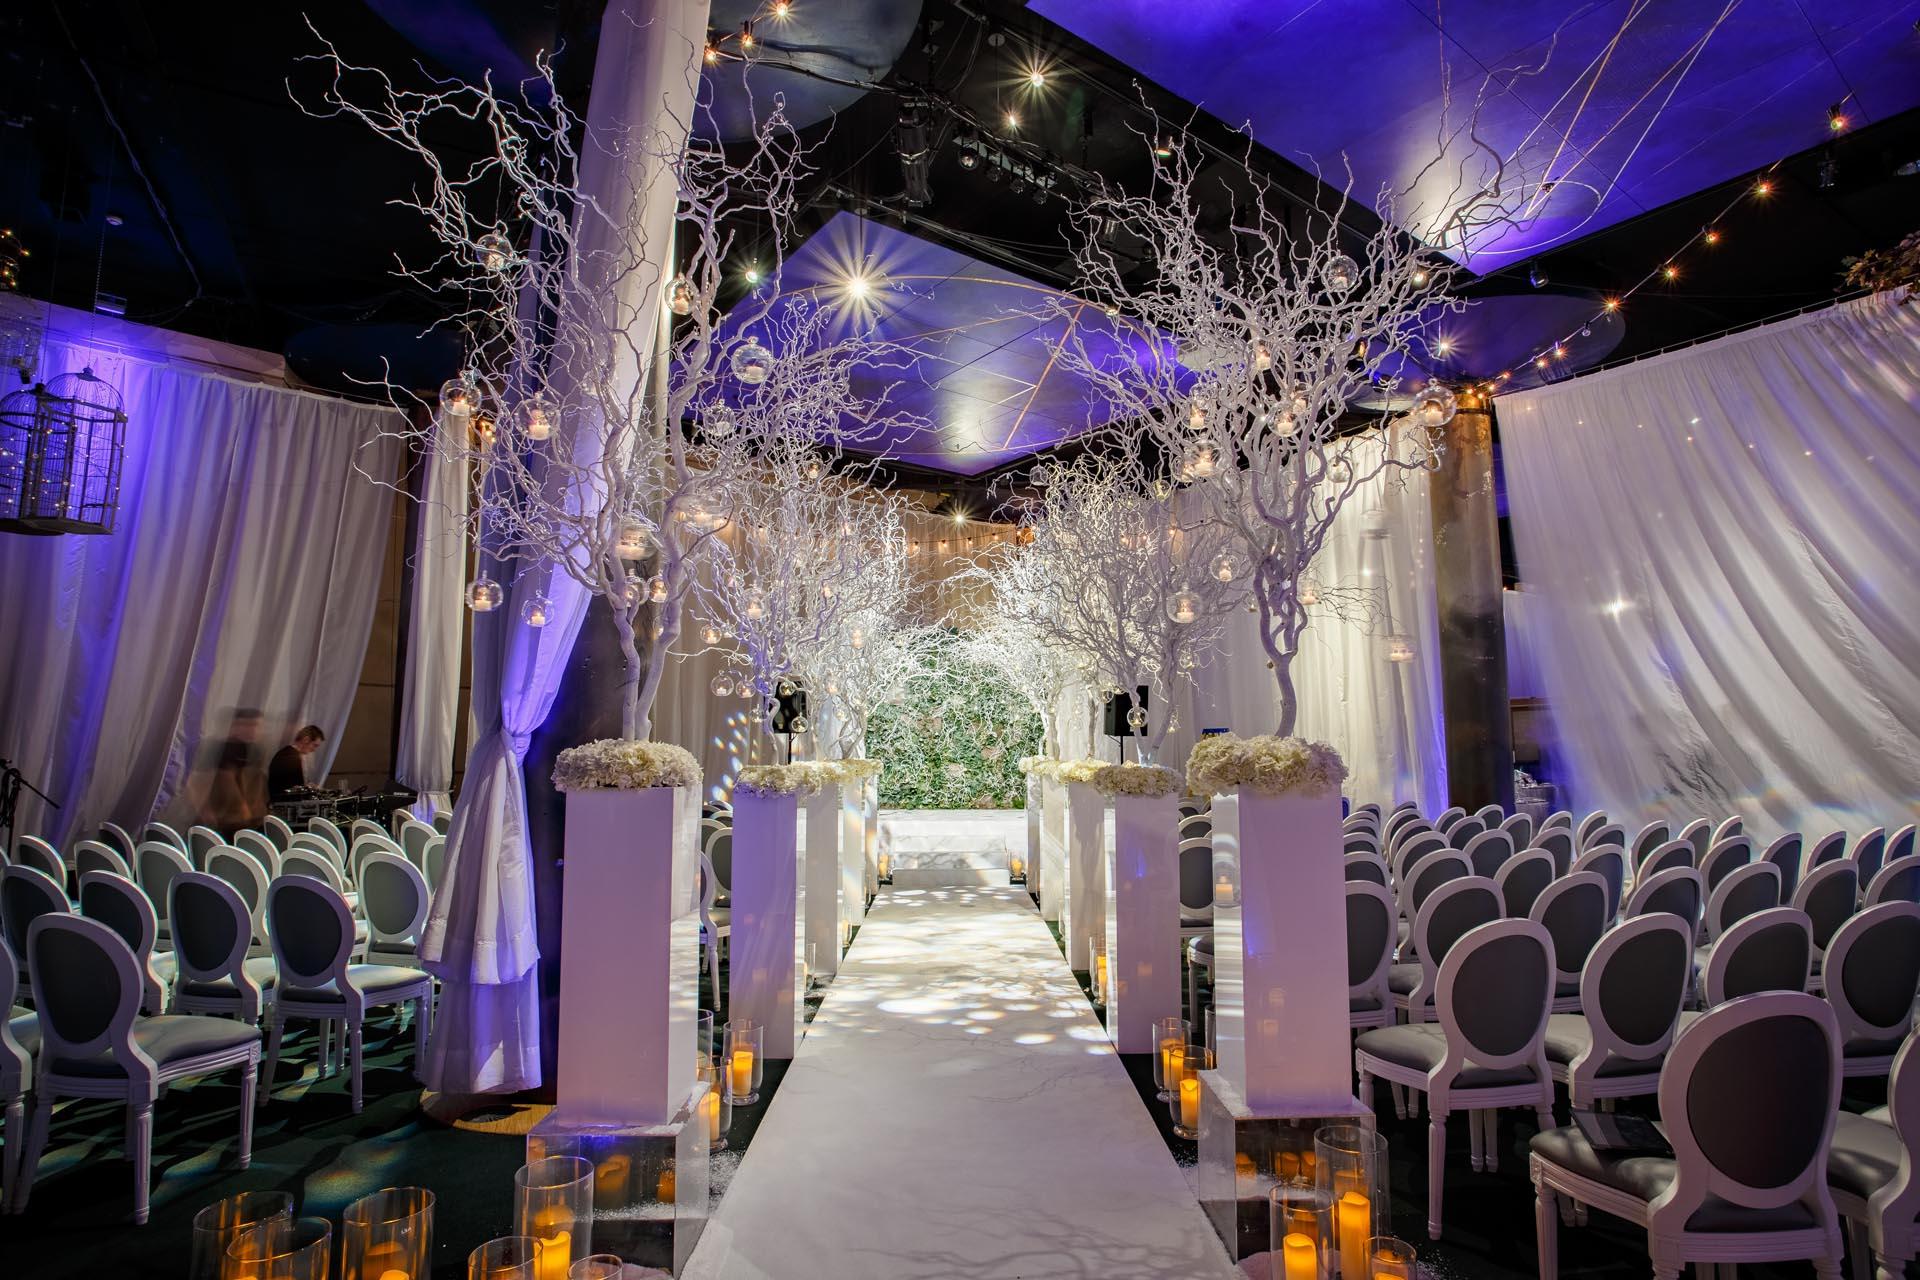 London wedding venues, The-Globe-Theatre-London